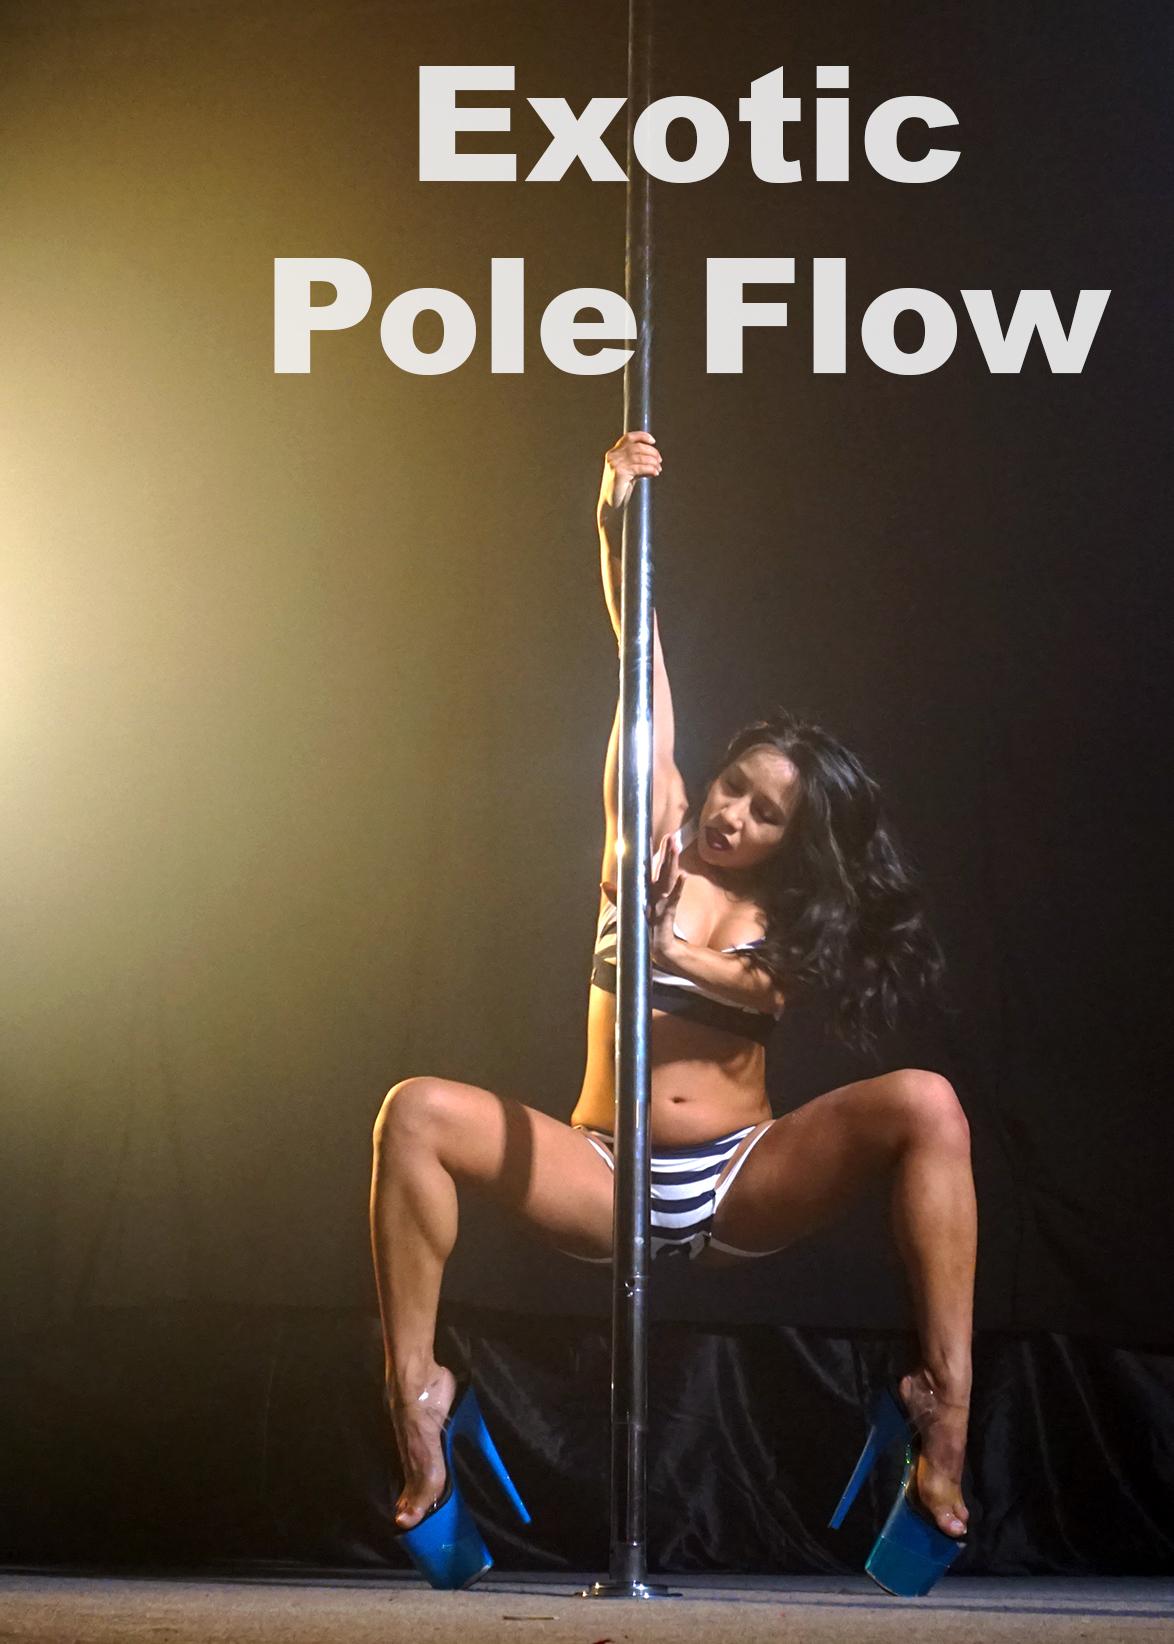 Exotic Pole Flow.jpg